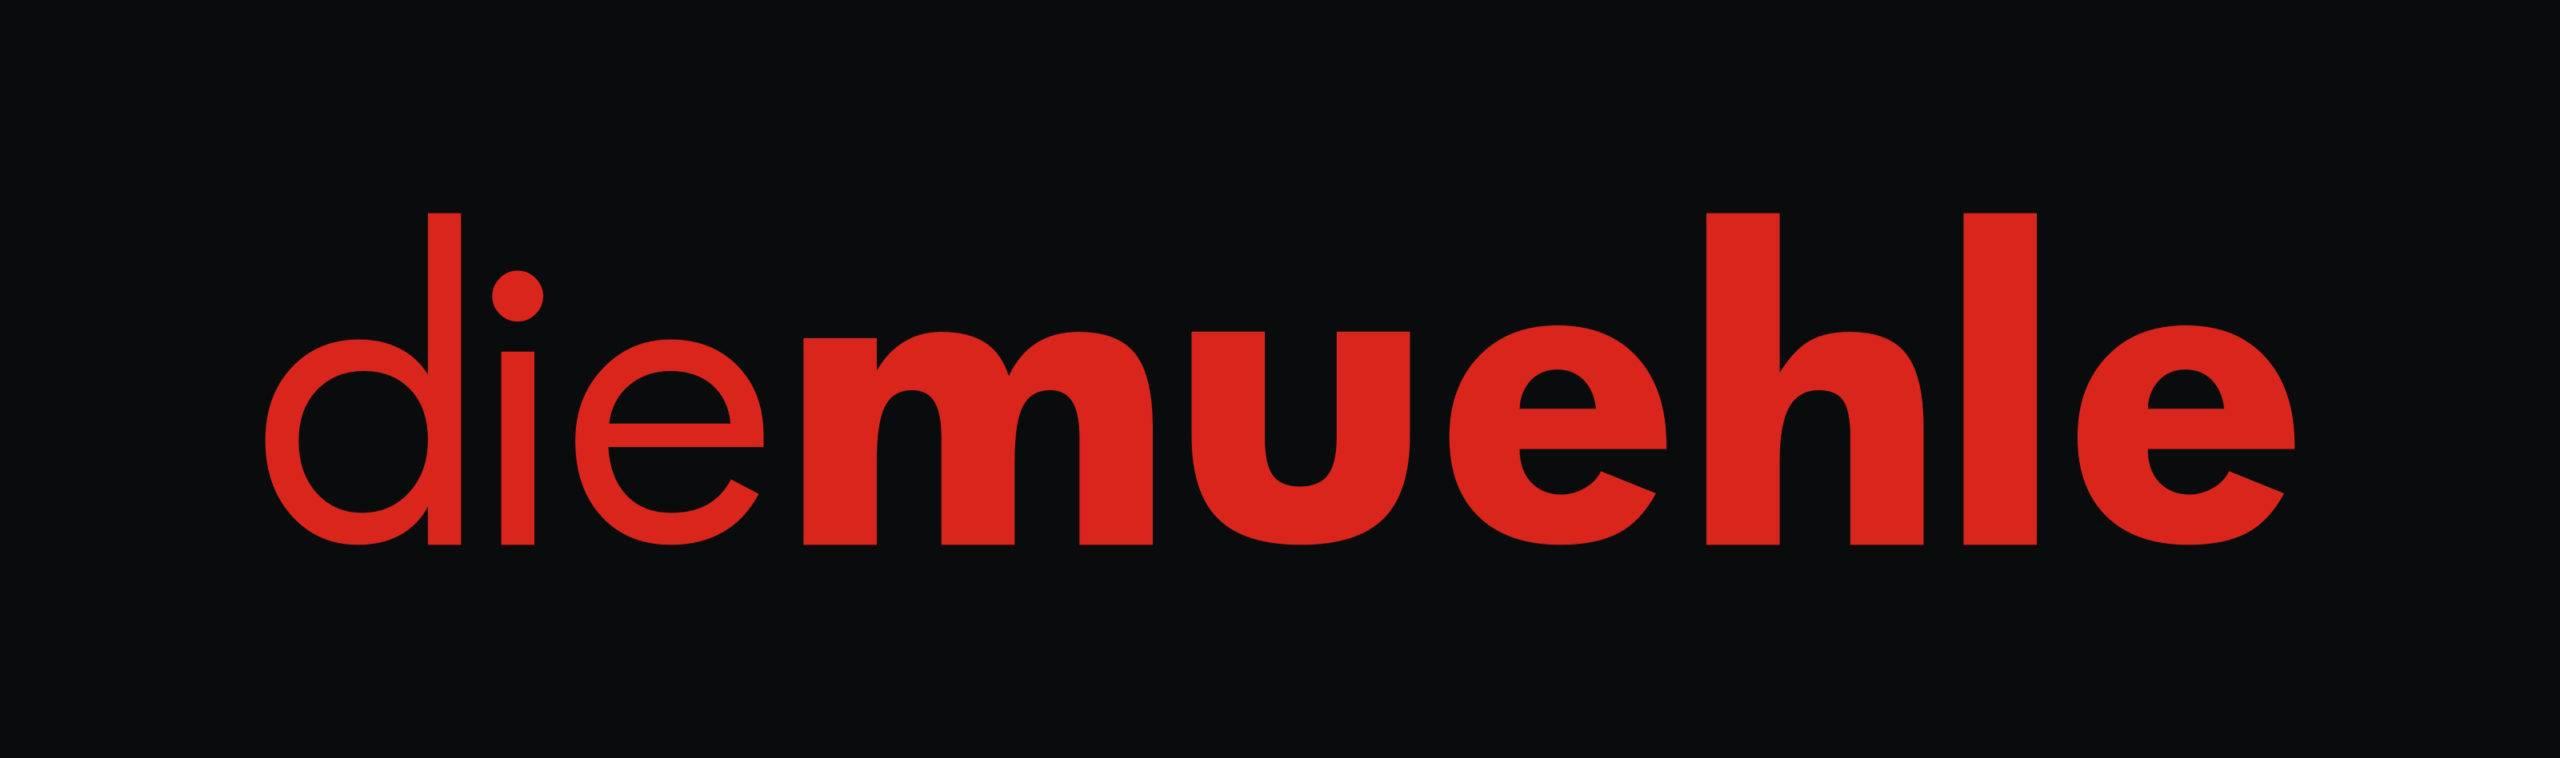 diemuehle - restaurant & webshop